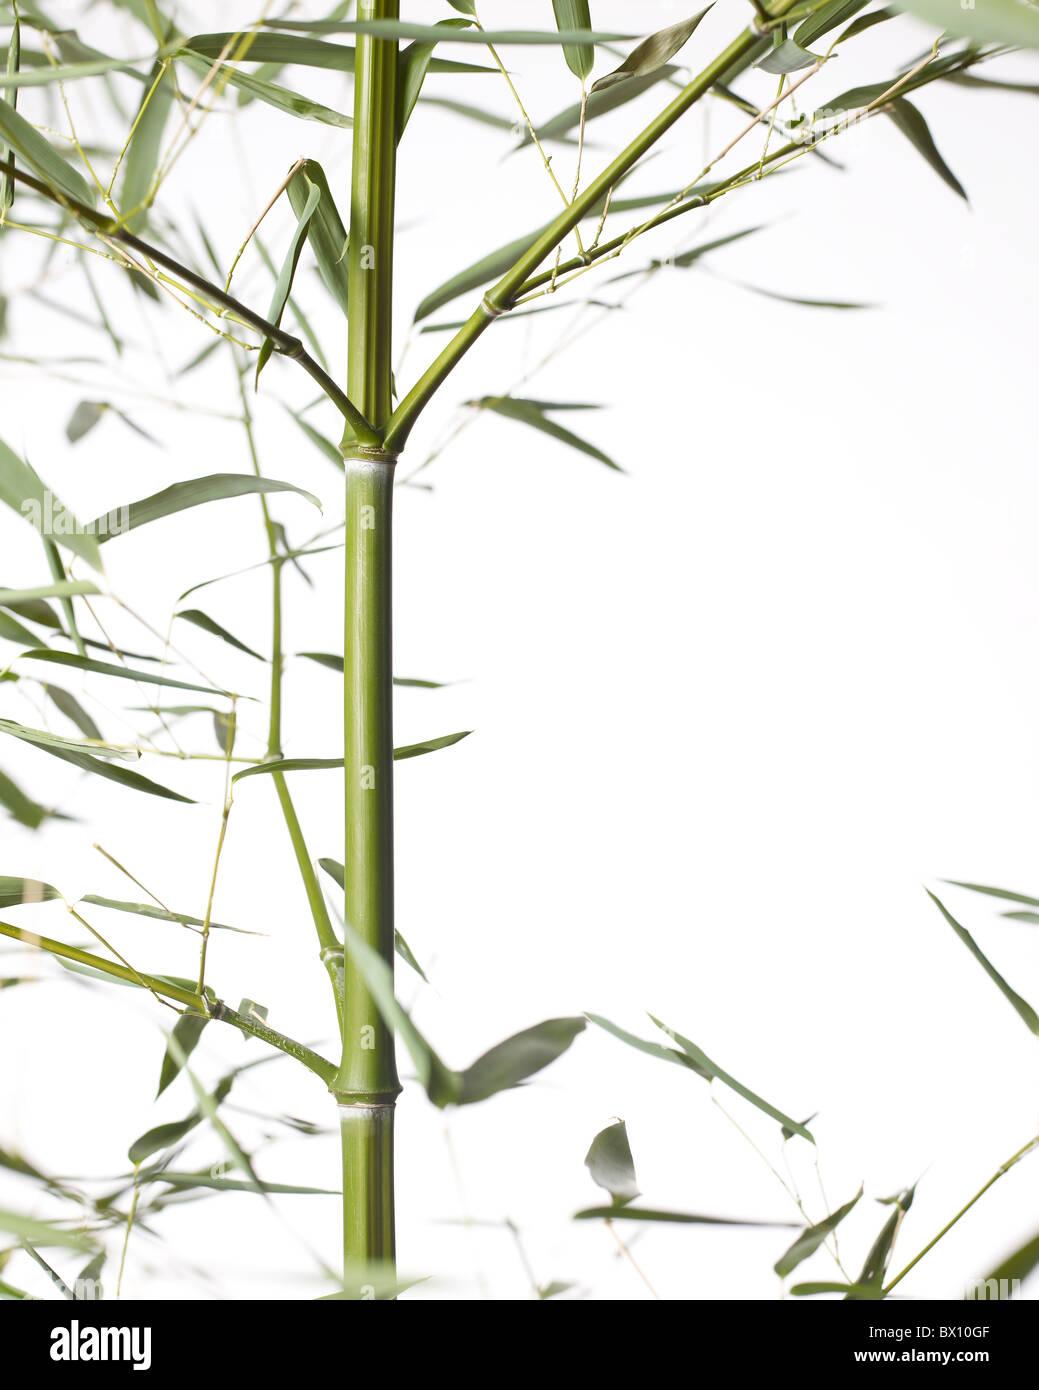 Bamboo stalk vertical - Stock Image